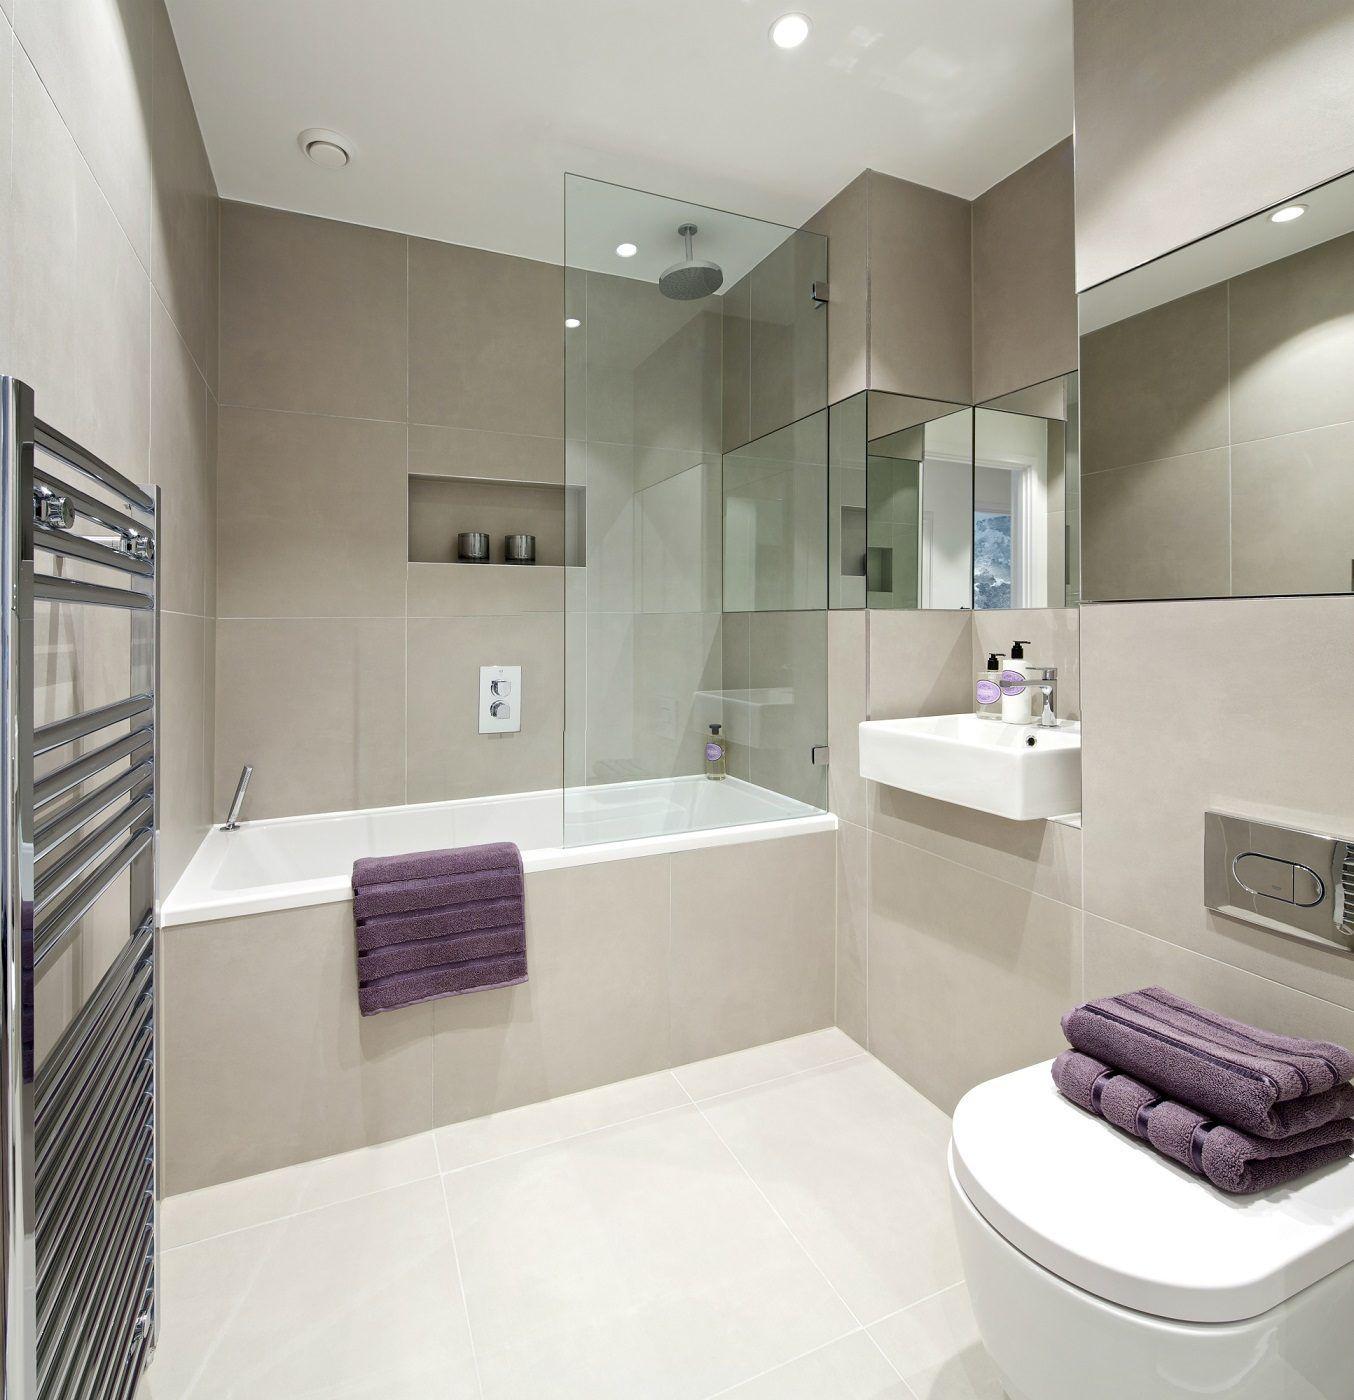 superb how to redo bathroom photograph-Amazing How to Redo Bathroom Pattern